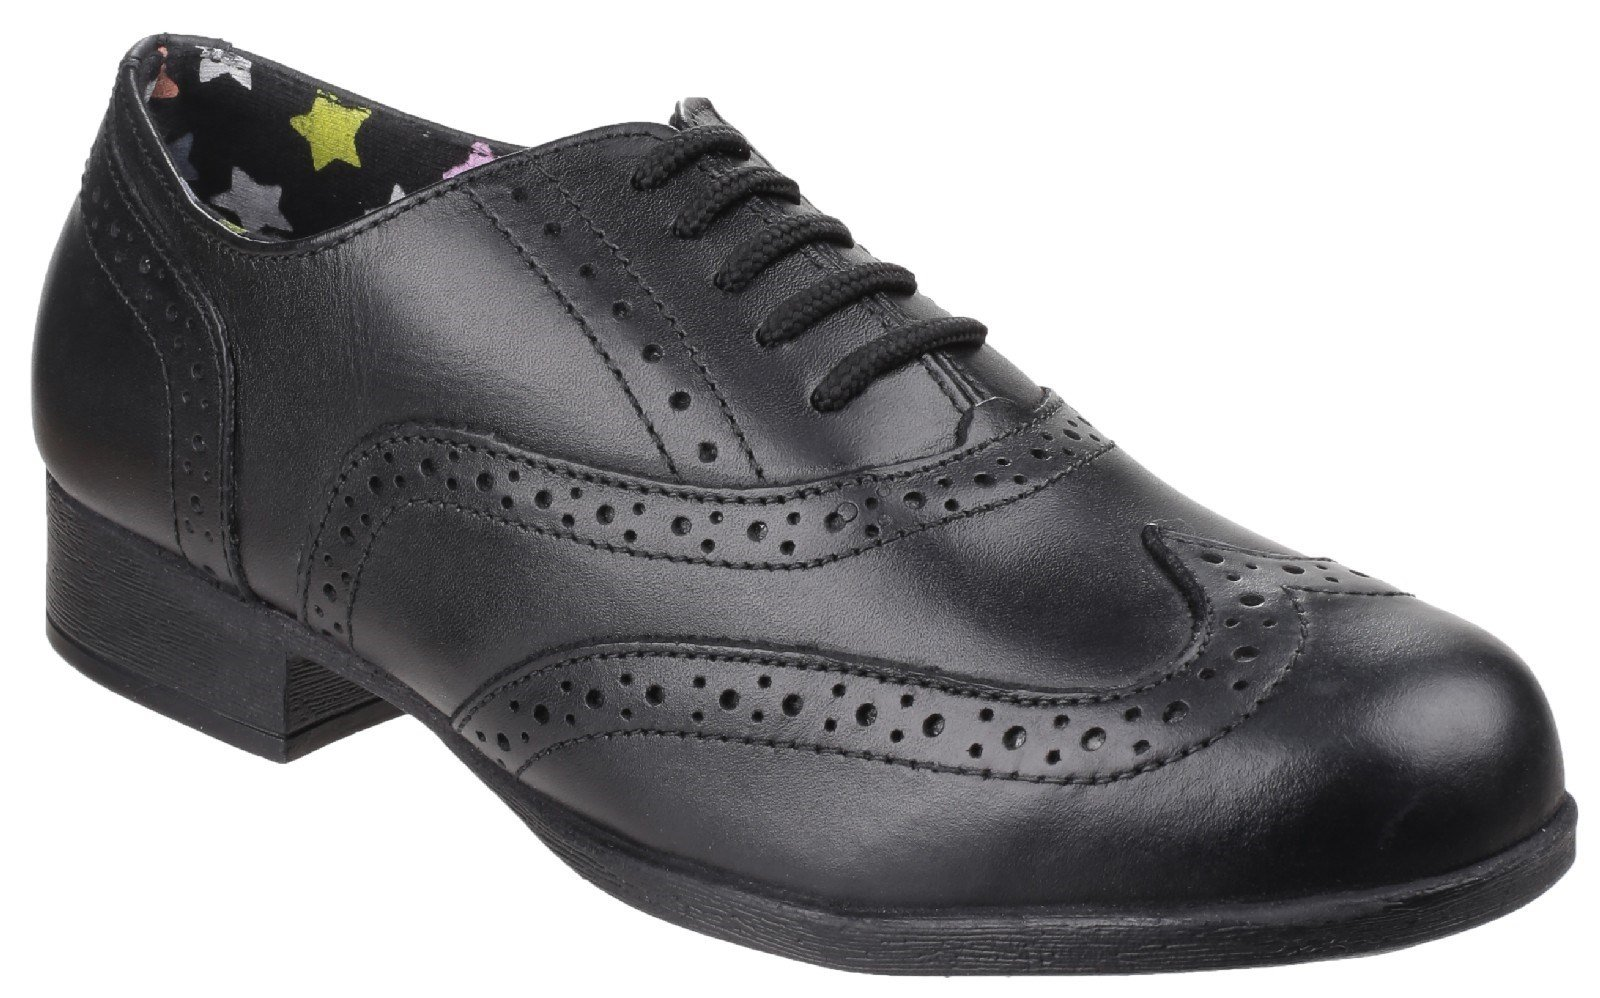 Hush Puppies Men's Kada Back To School Shoe Black 25336 - Black 13